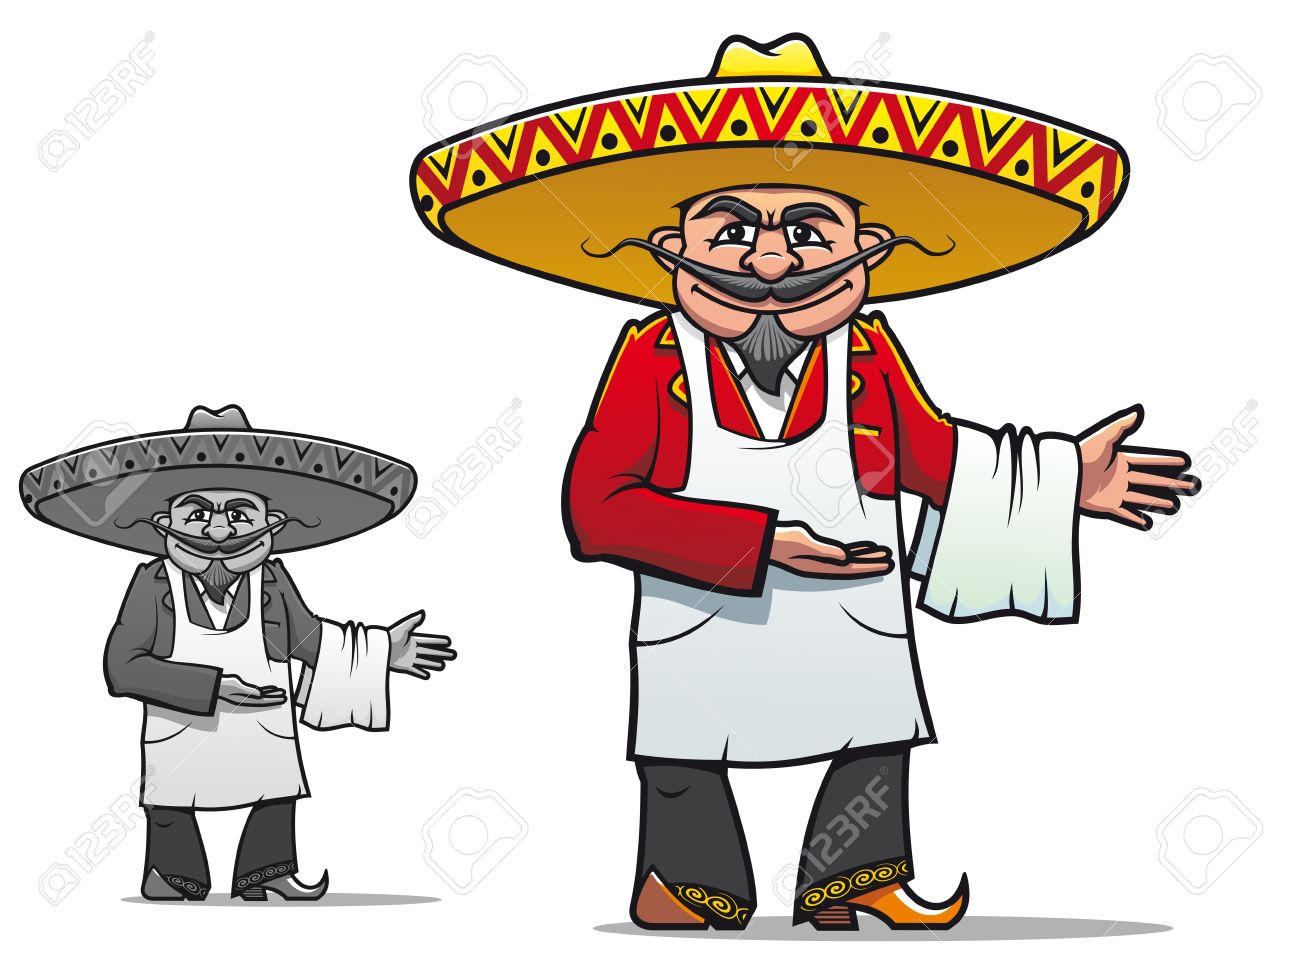 Mexican chef in sombrero for national restaurant design Stock Vector - 13604011